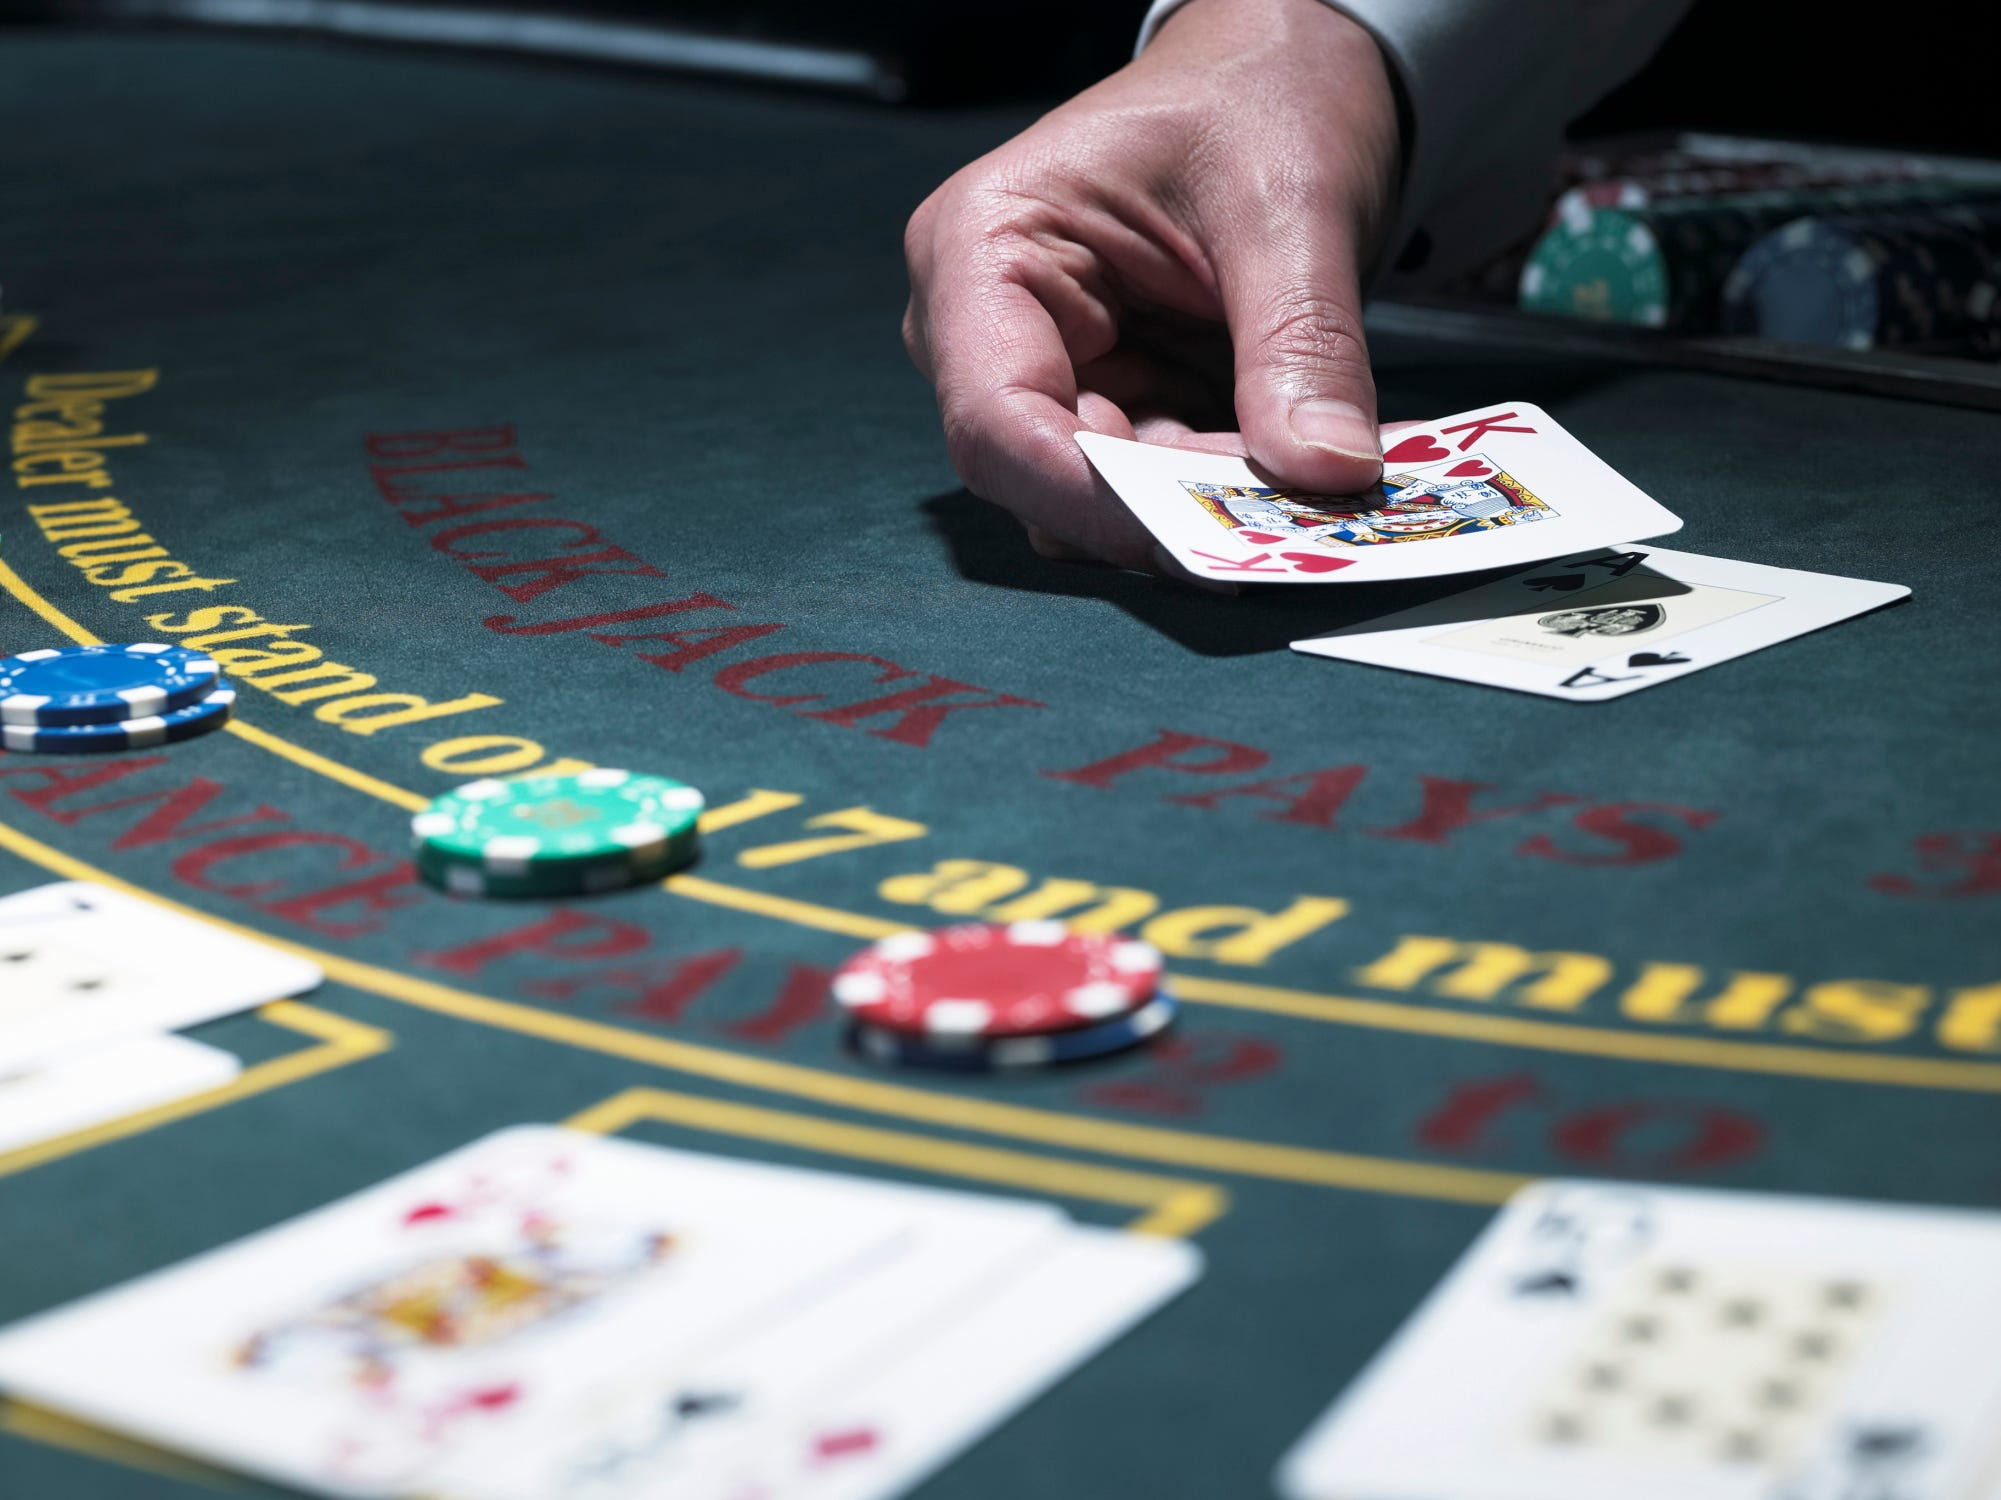 Wisconsin appleton legal gambling identification of casino chip